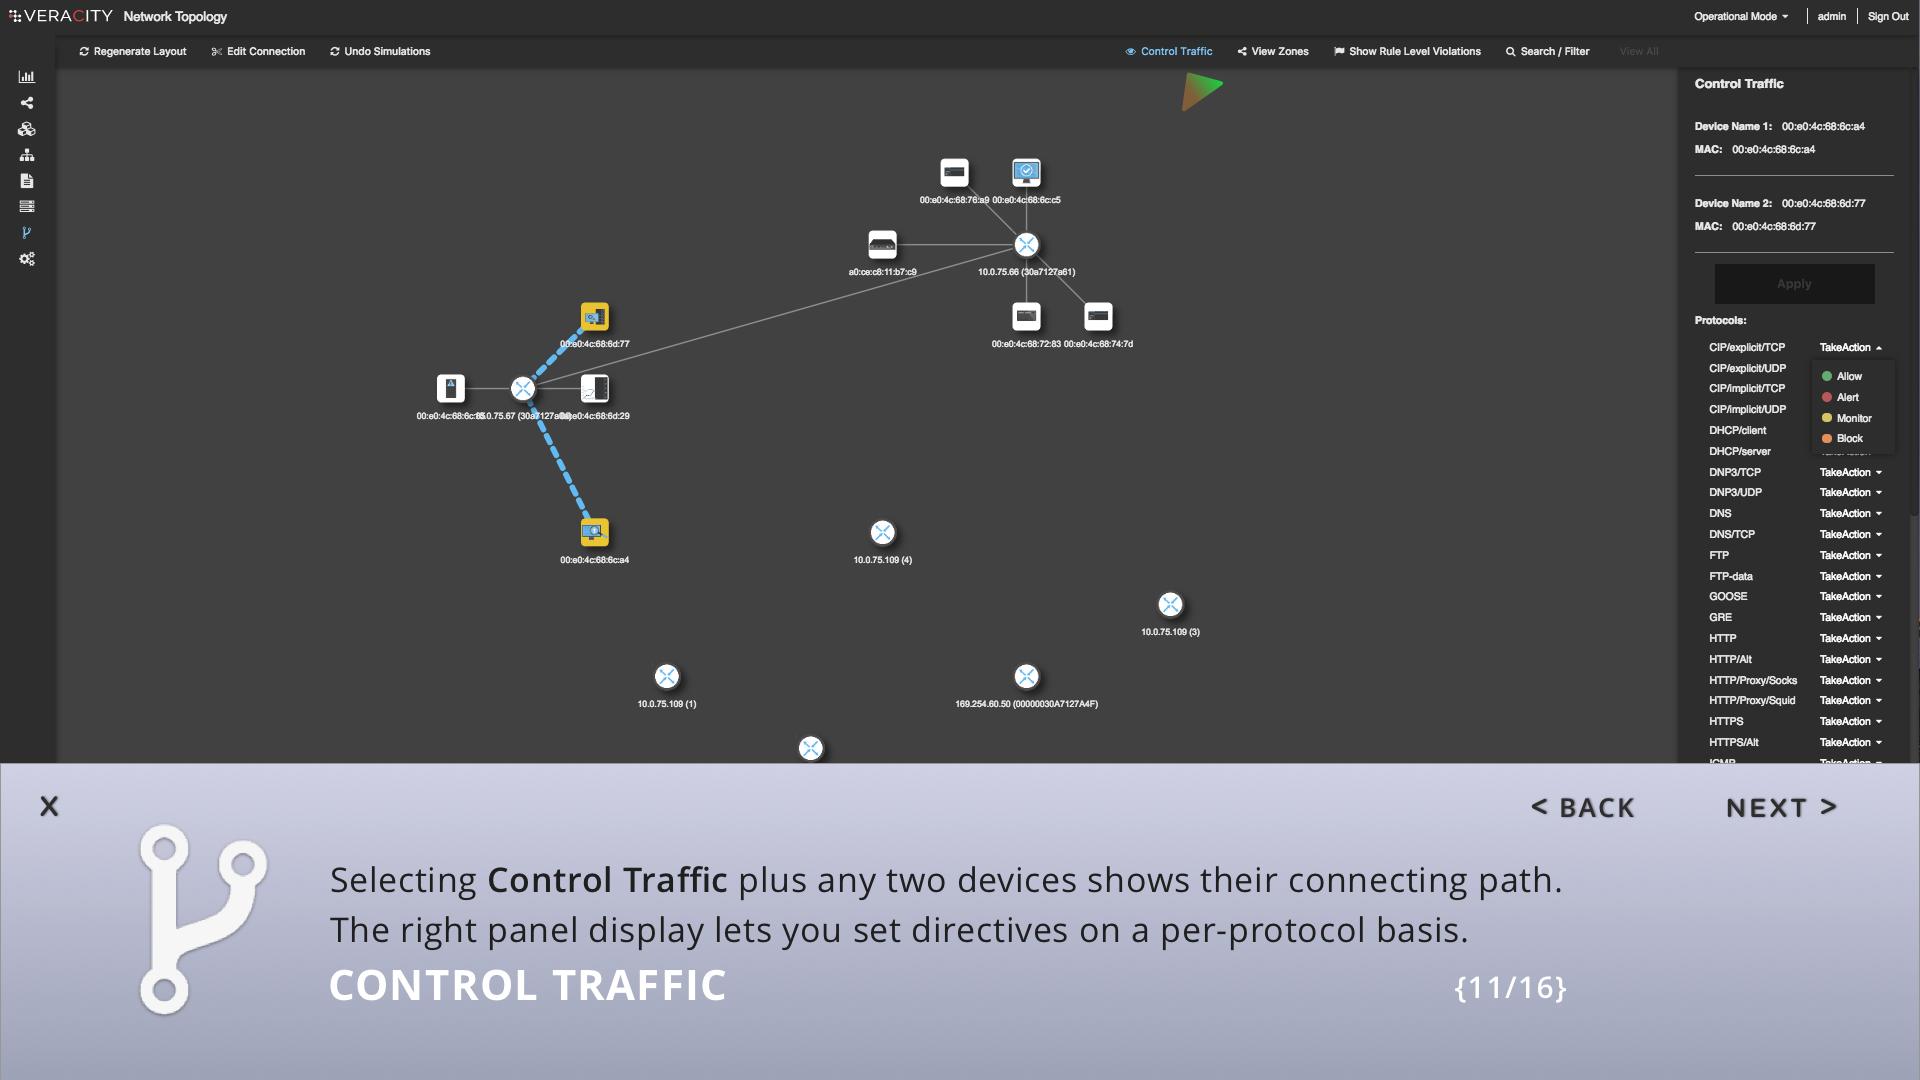 012B_Control_Traffic_Final.png